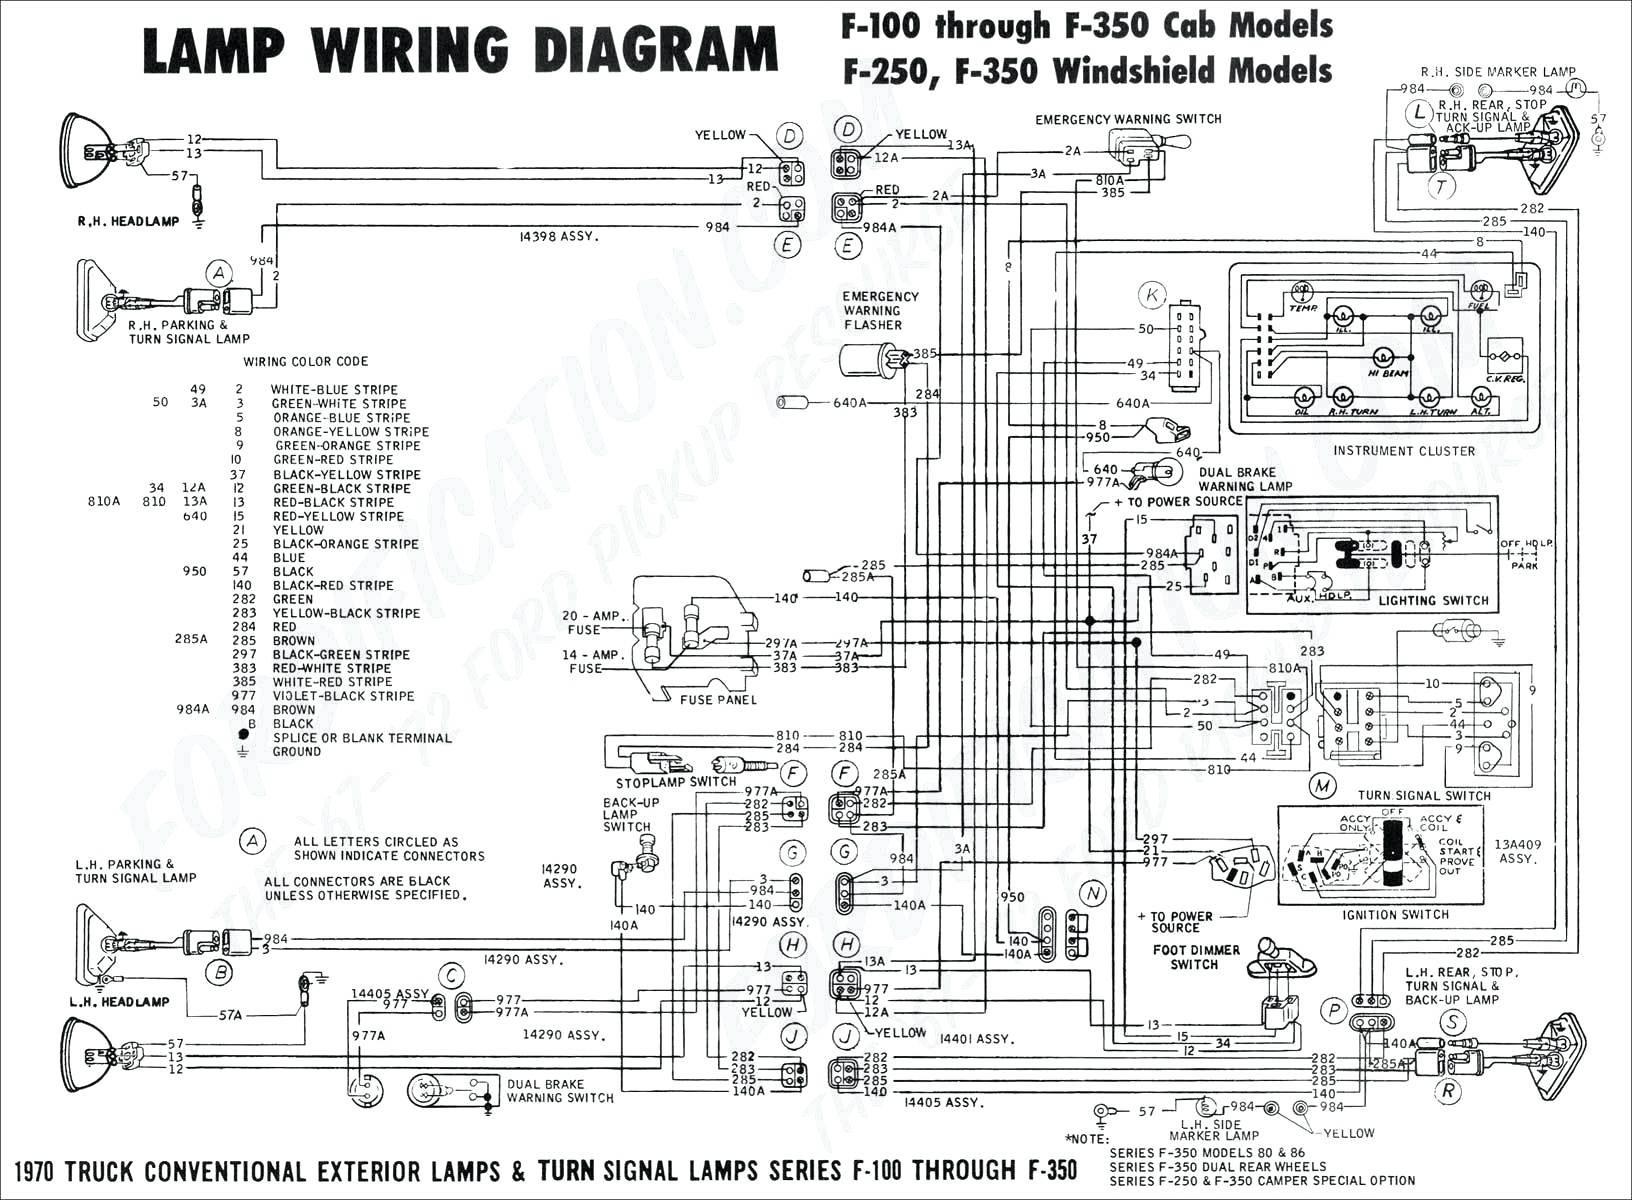 1983 chevy truck vacuum diagrams